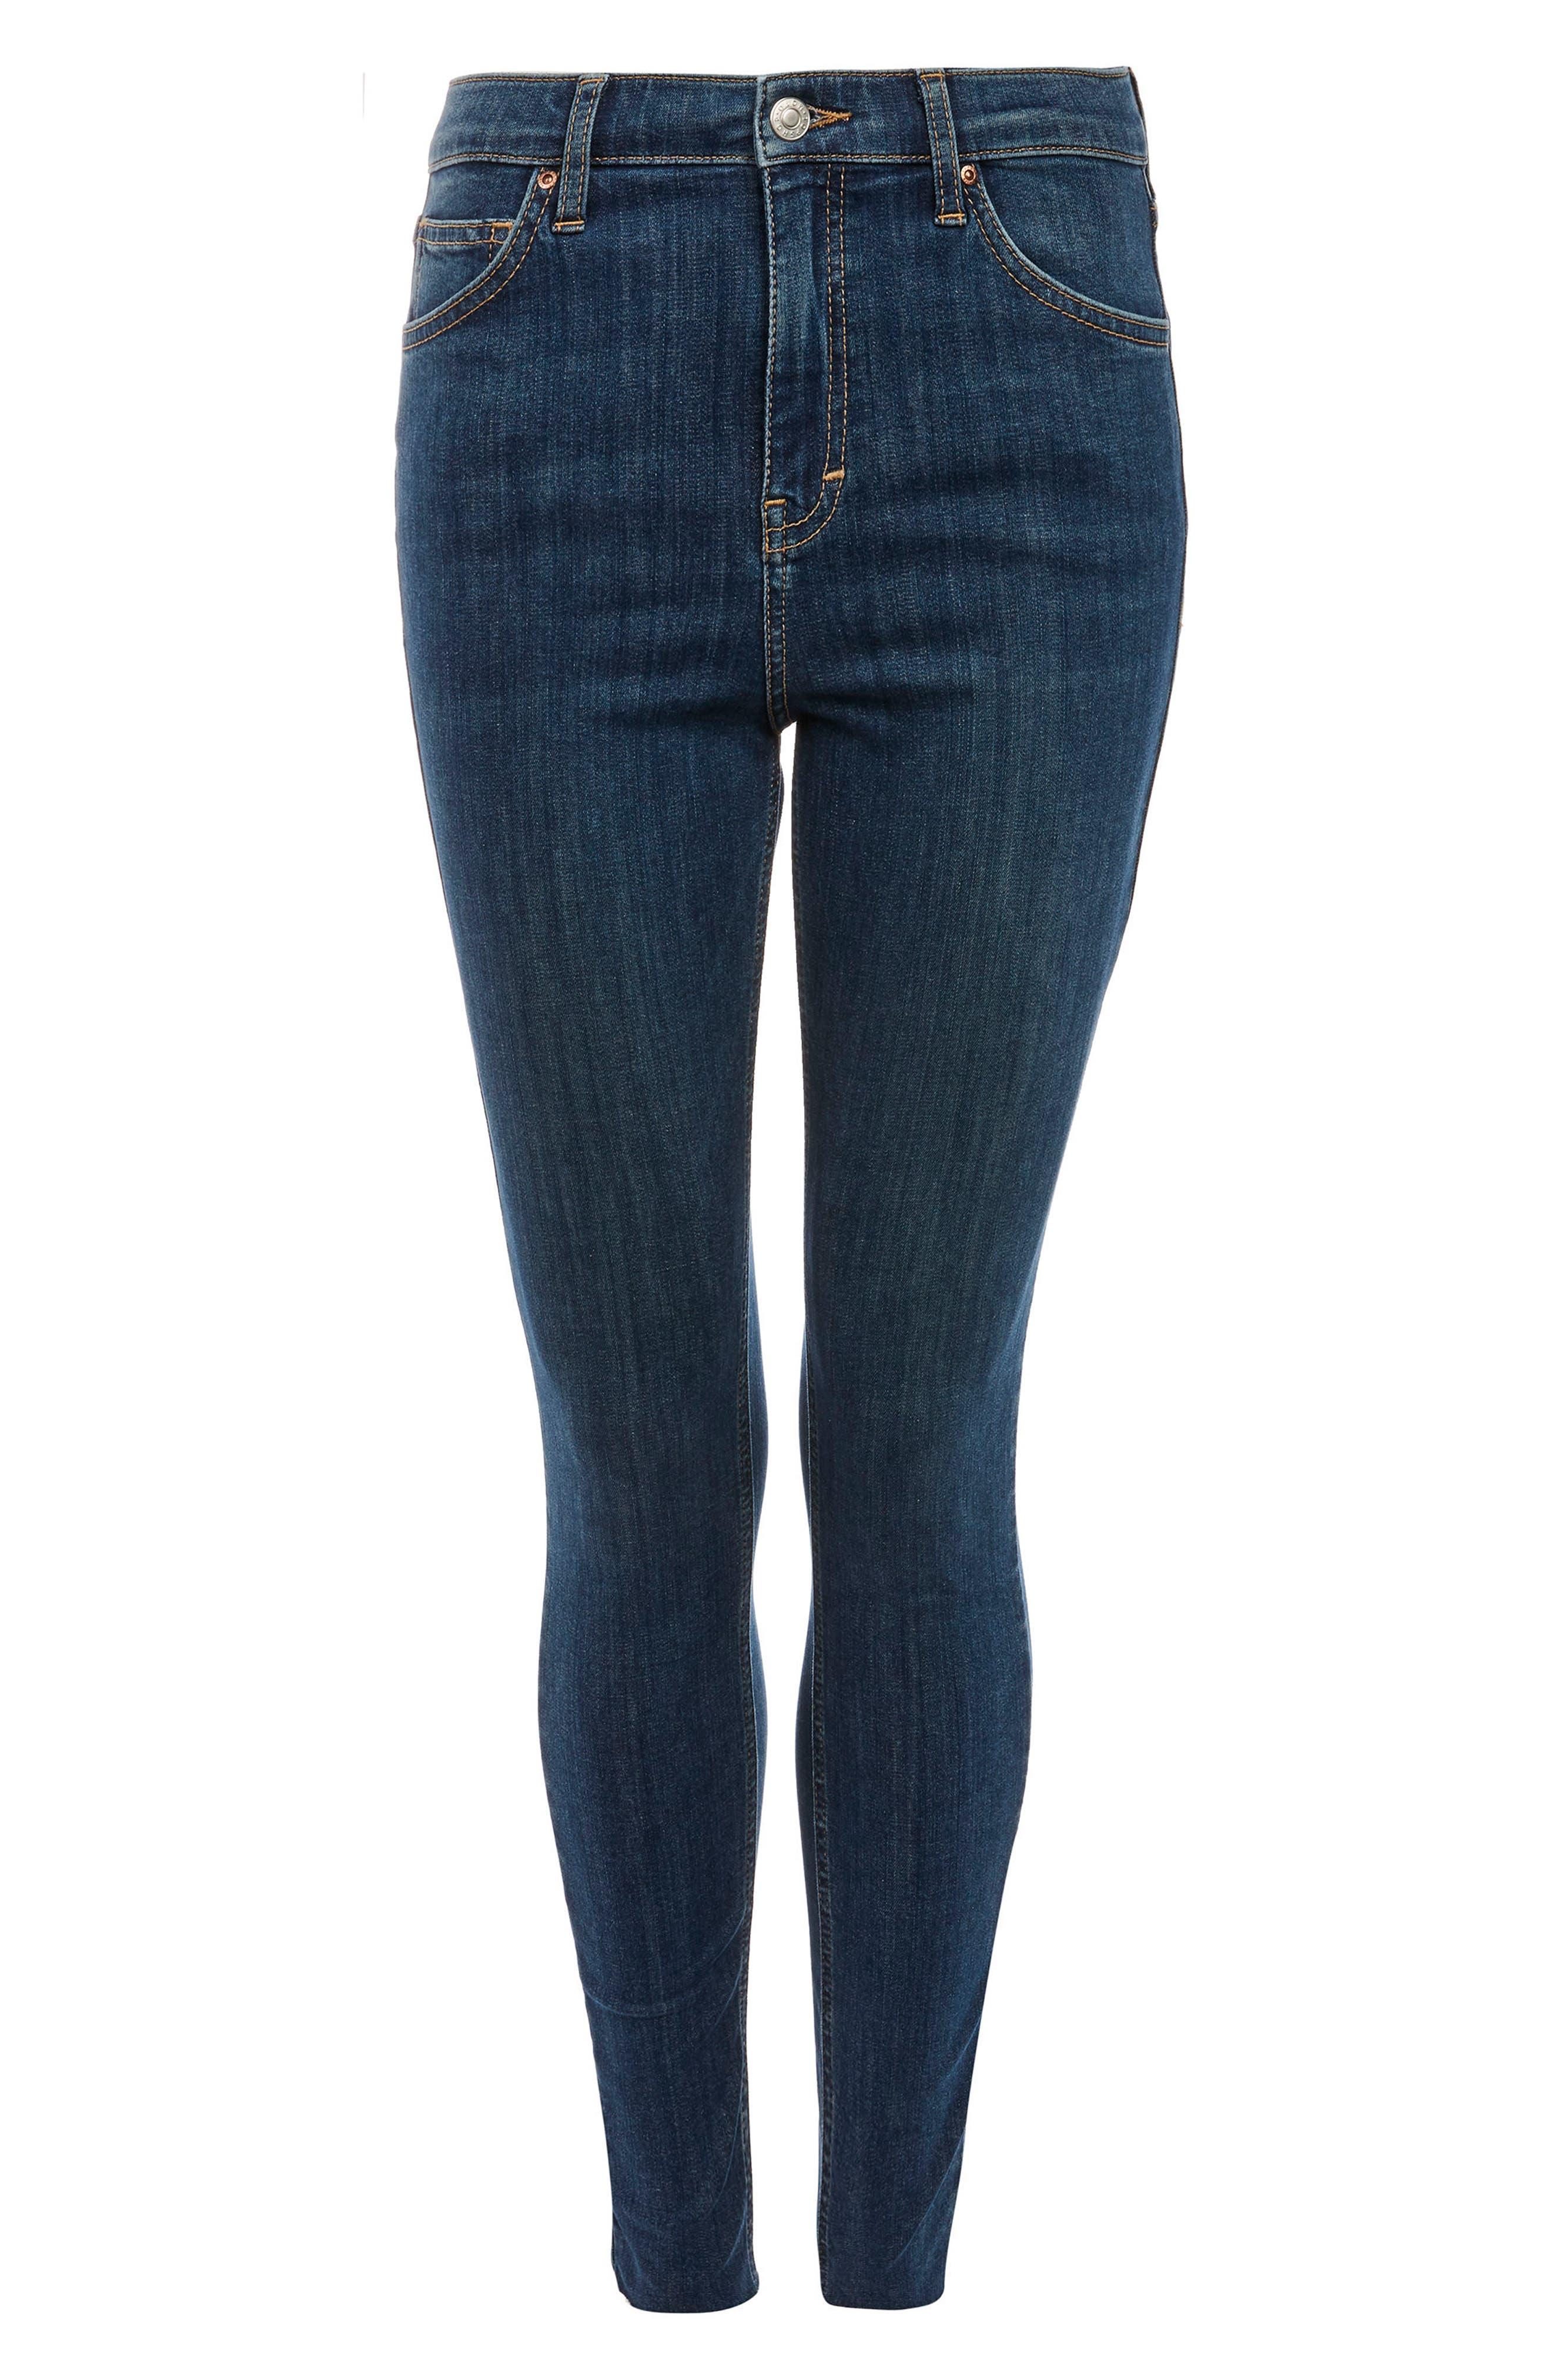 Jamie Released Hem Ankle Skinny Jeans,                             Alternate thumbnail 4, color,                             Mid Denim